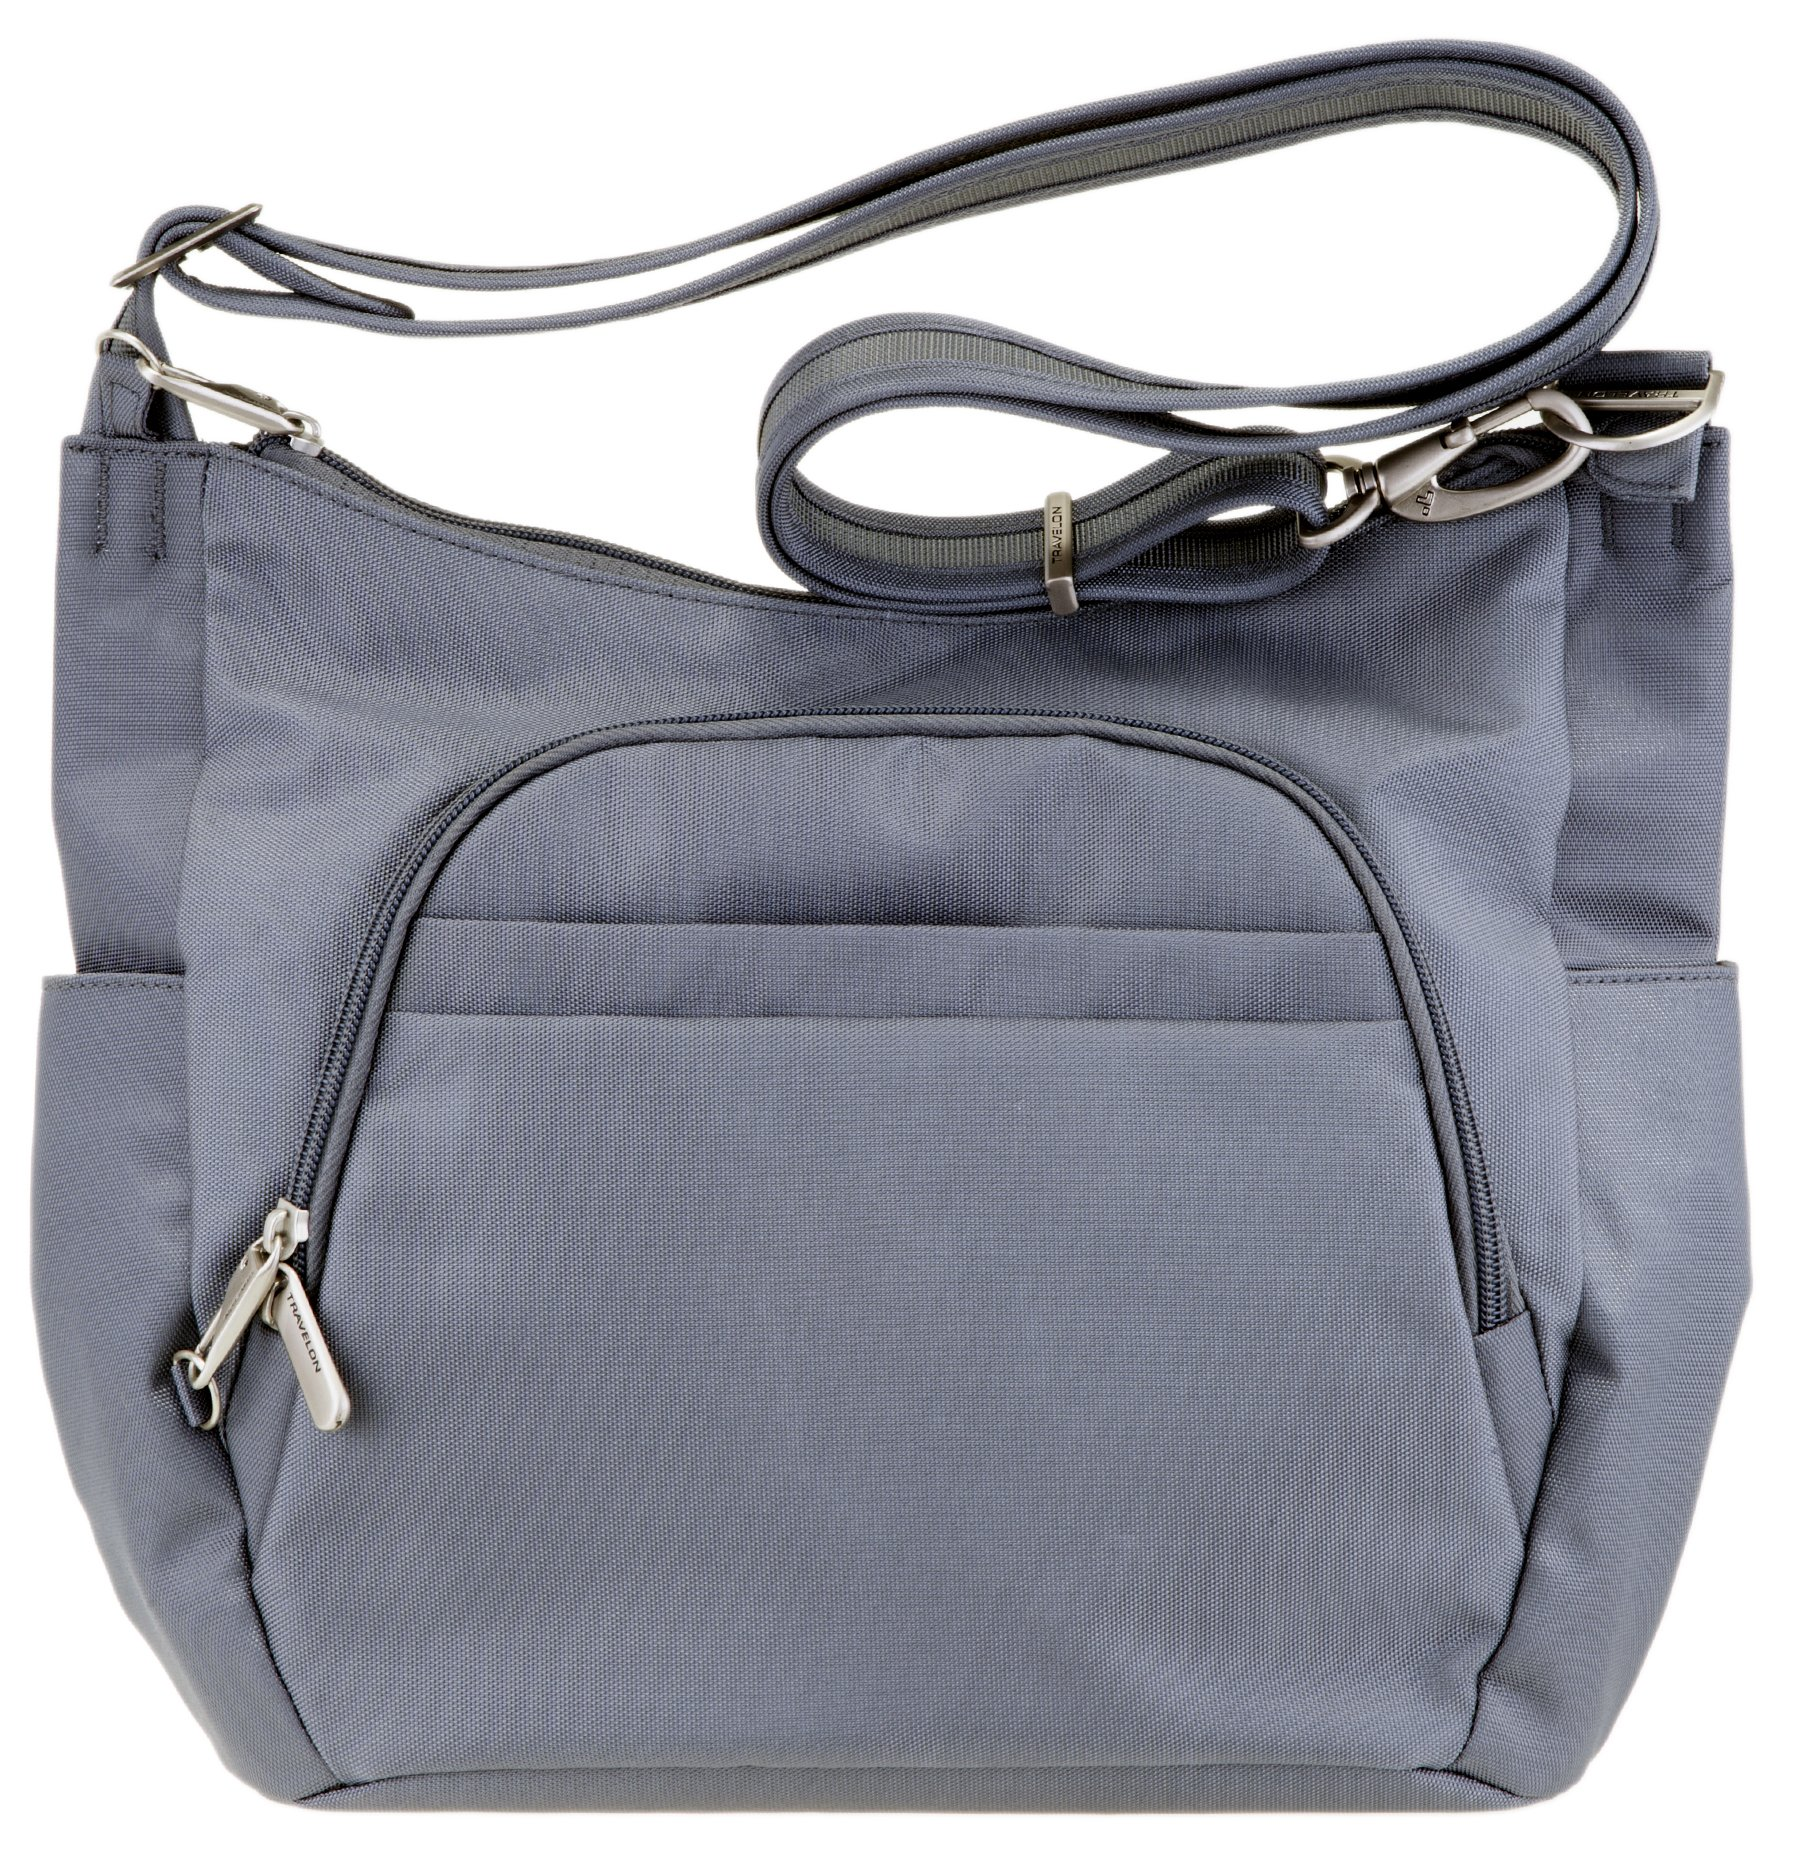 Travelon Anti-Theft Cross-Body Bucket Bag (Pewter)